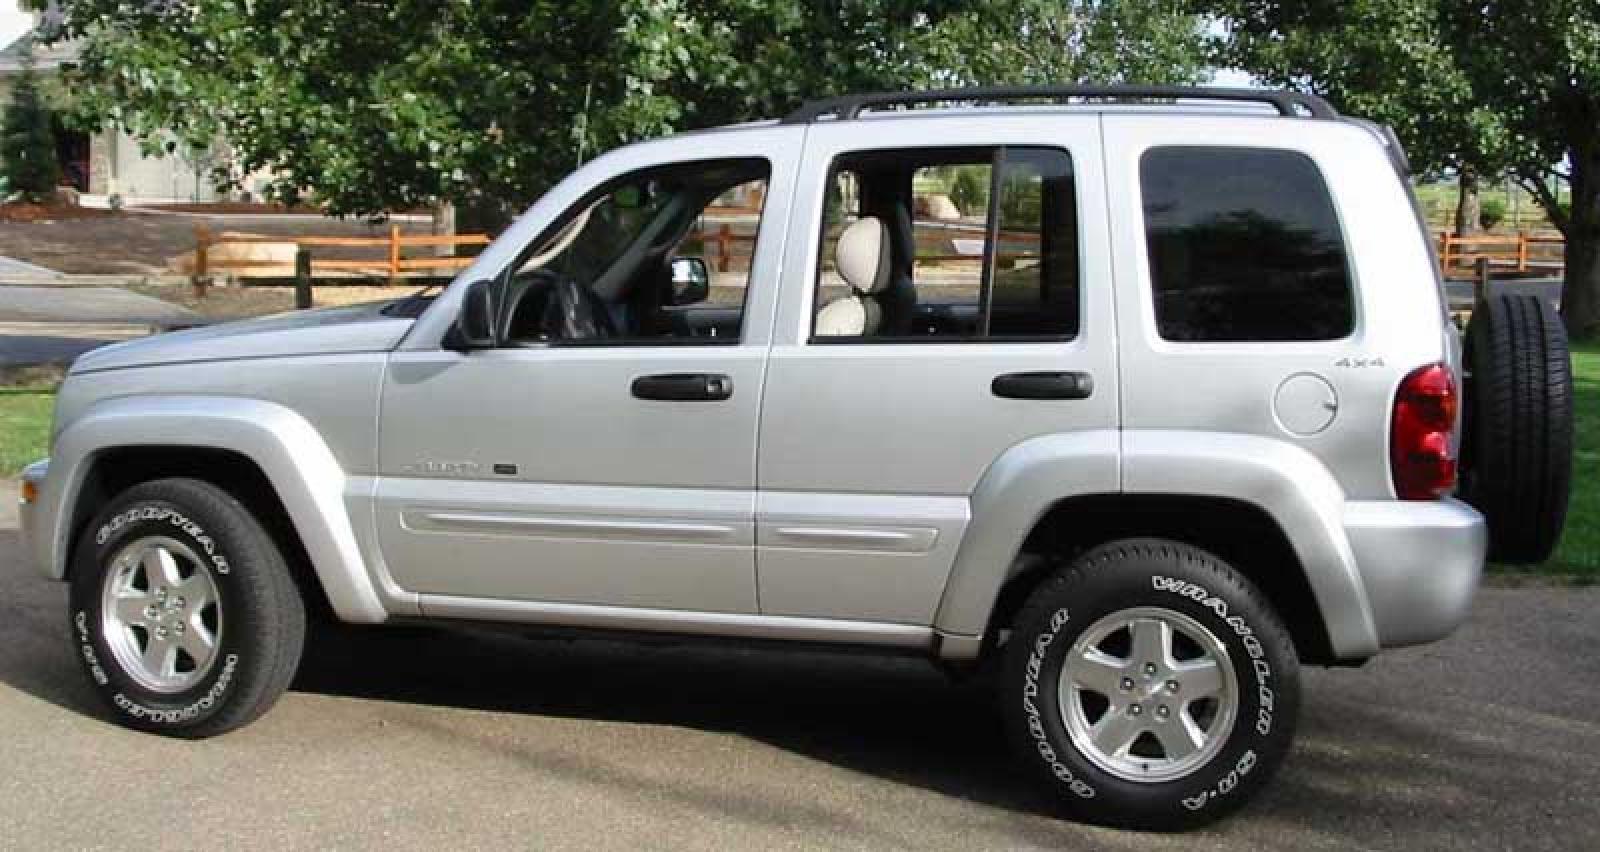 2002 Jeep Liberty #1 800 1024 1280 1600 Origin